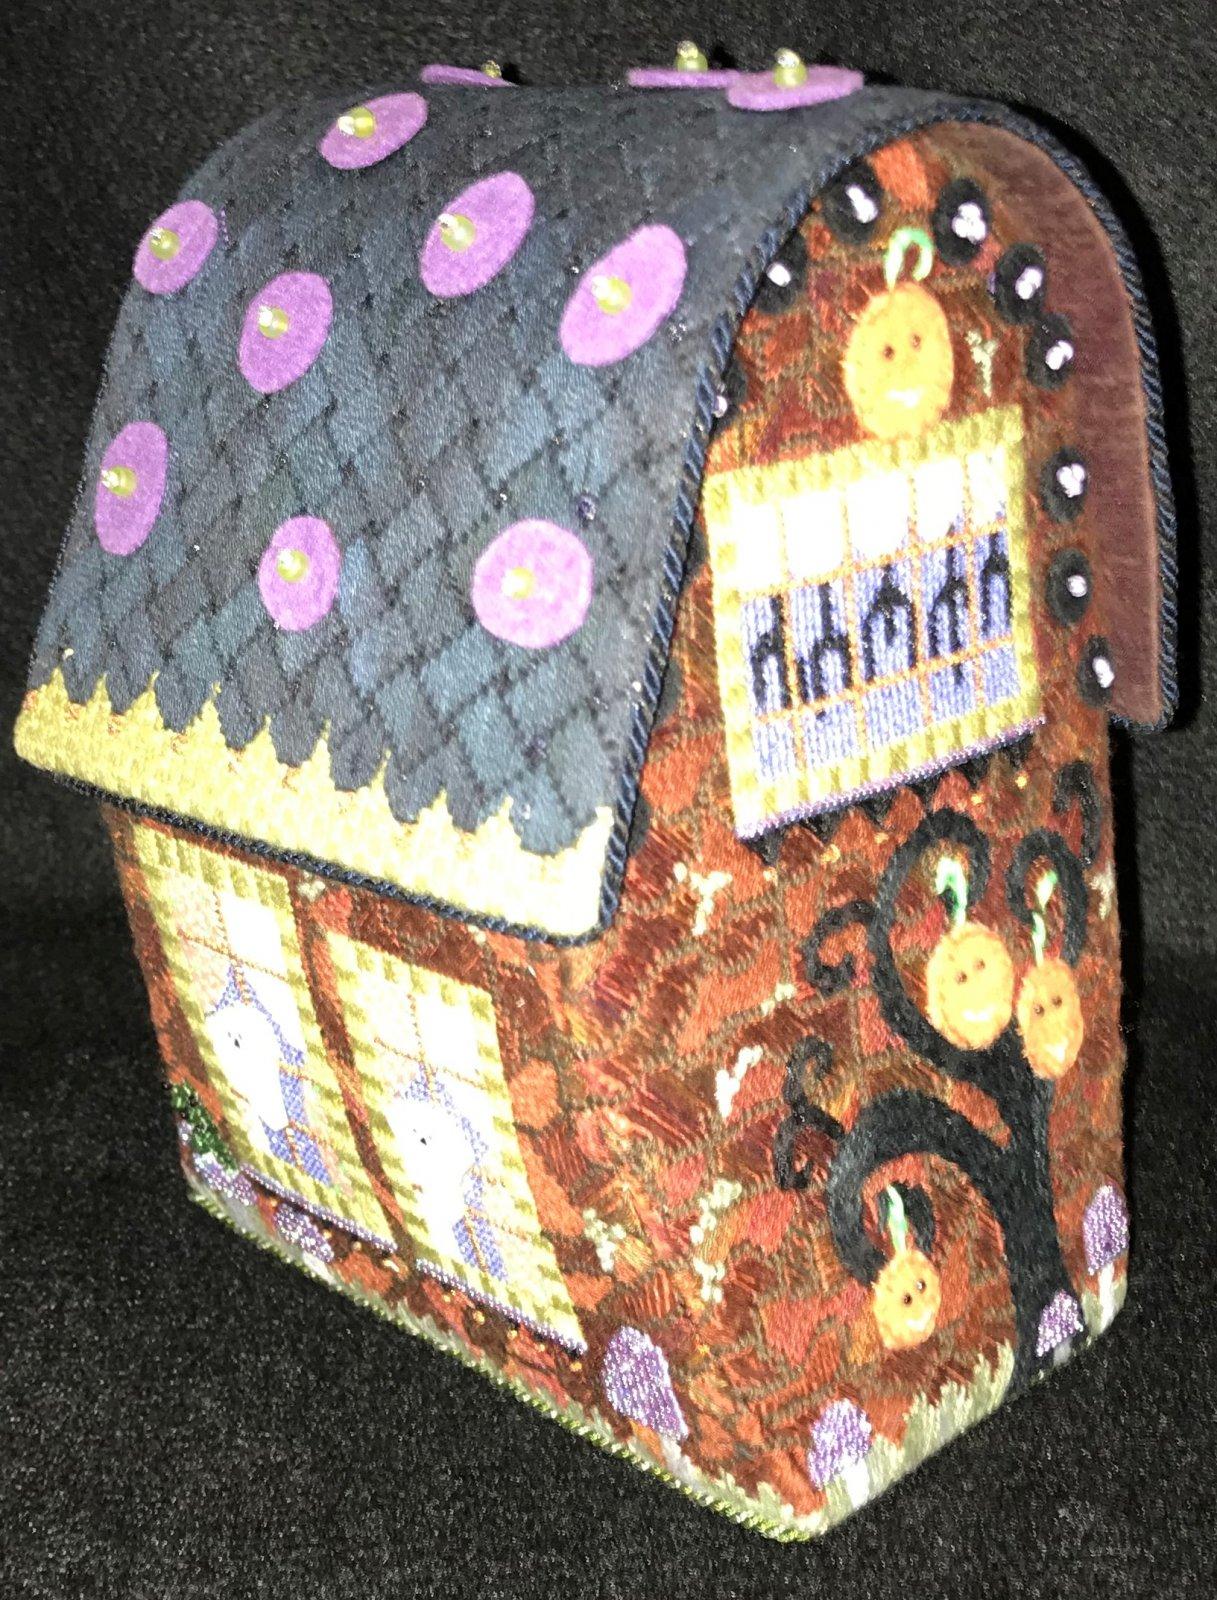 Wacky Halloween House - Stitched by Jann B.